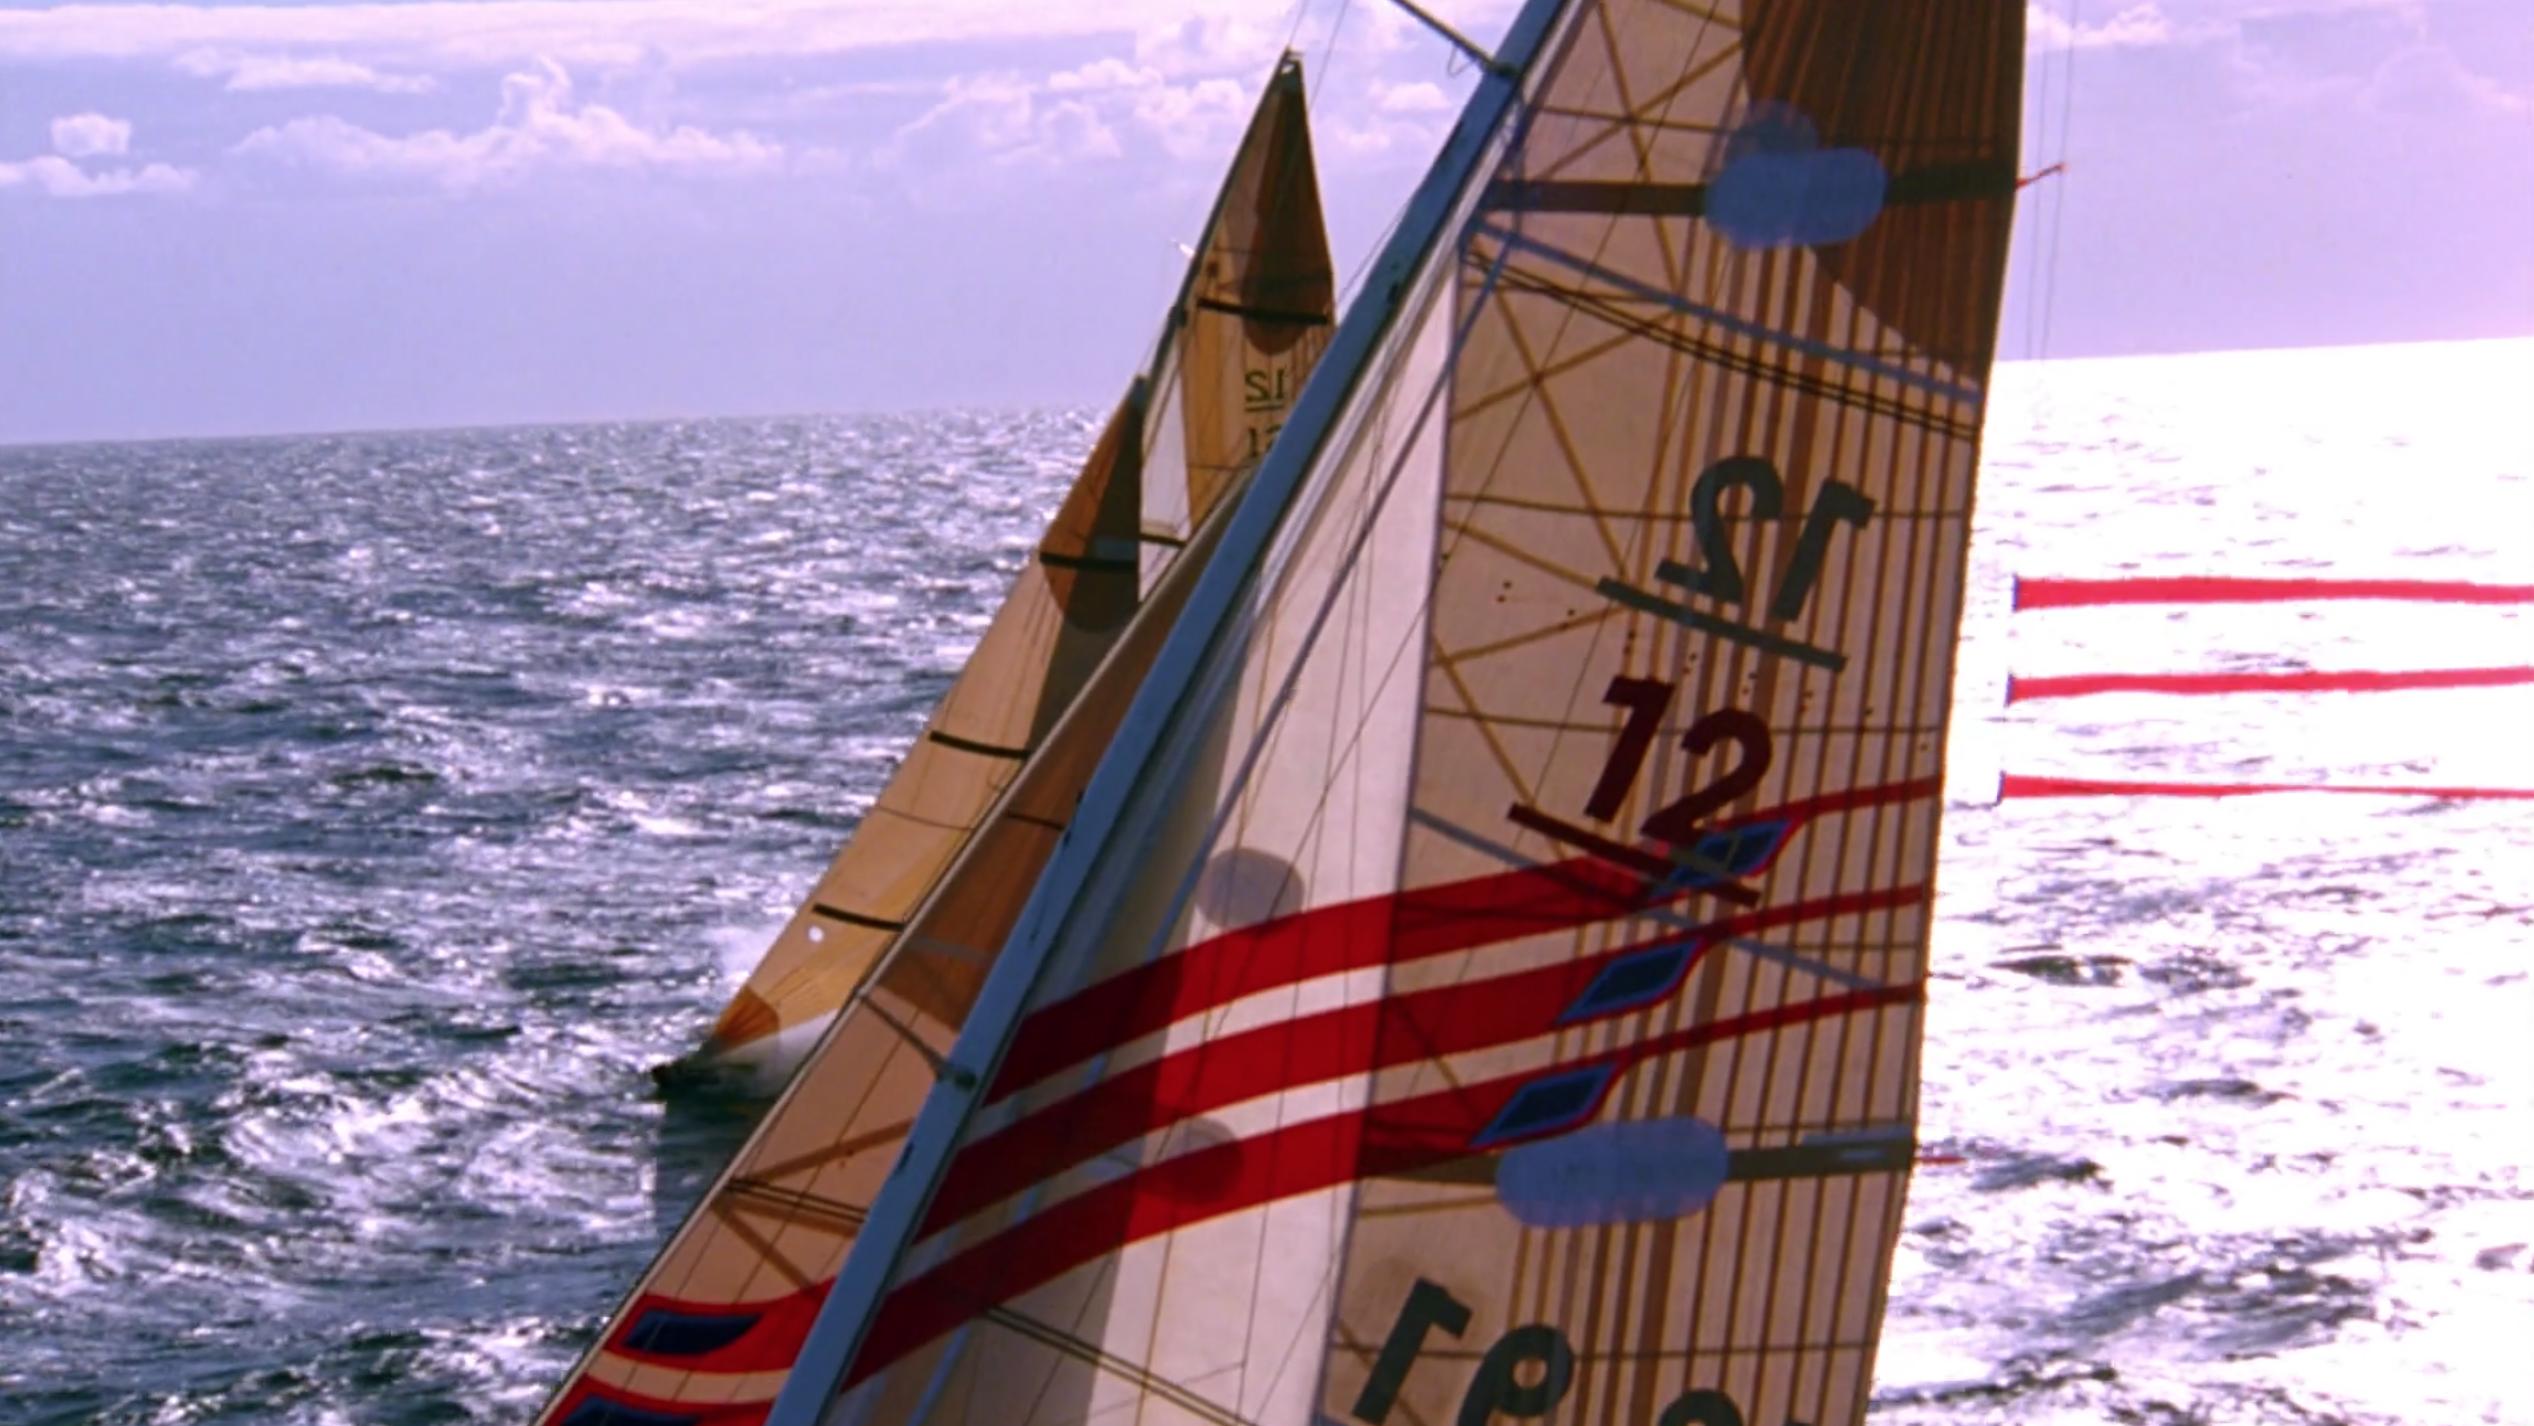 wind sails